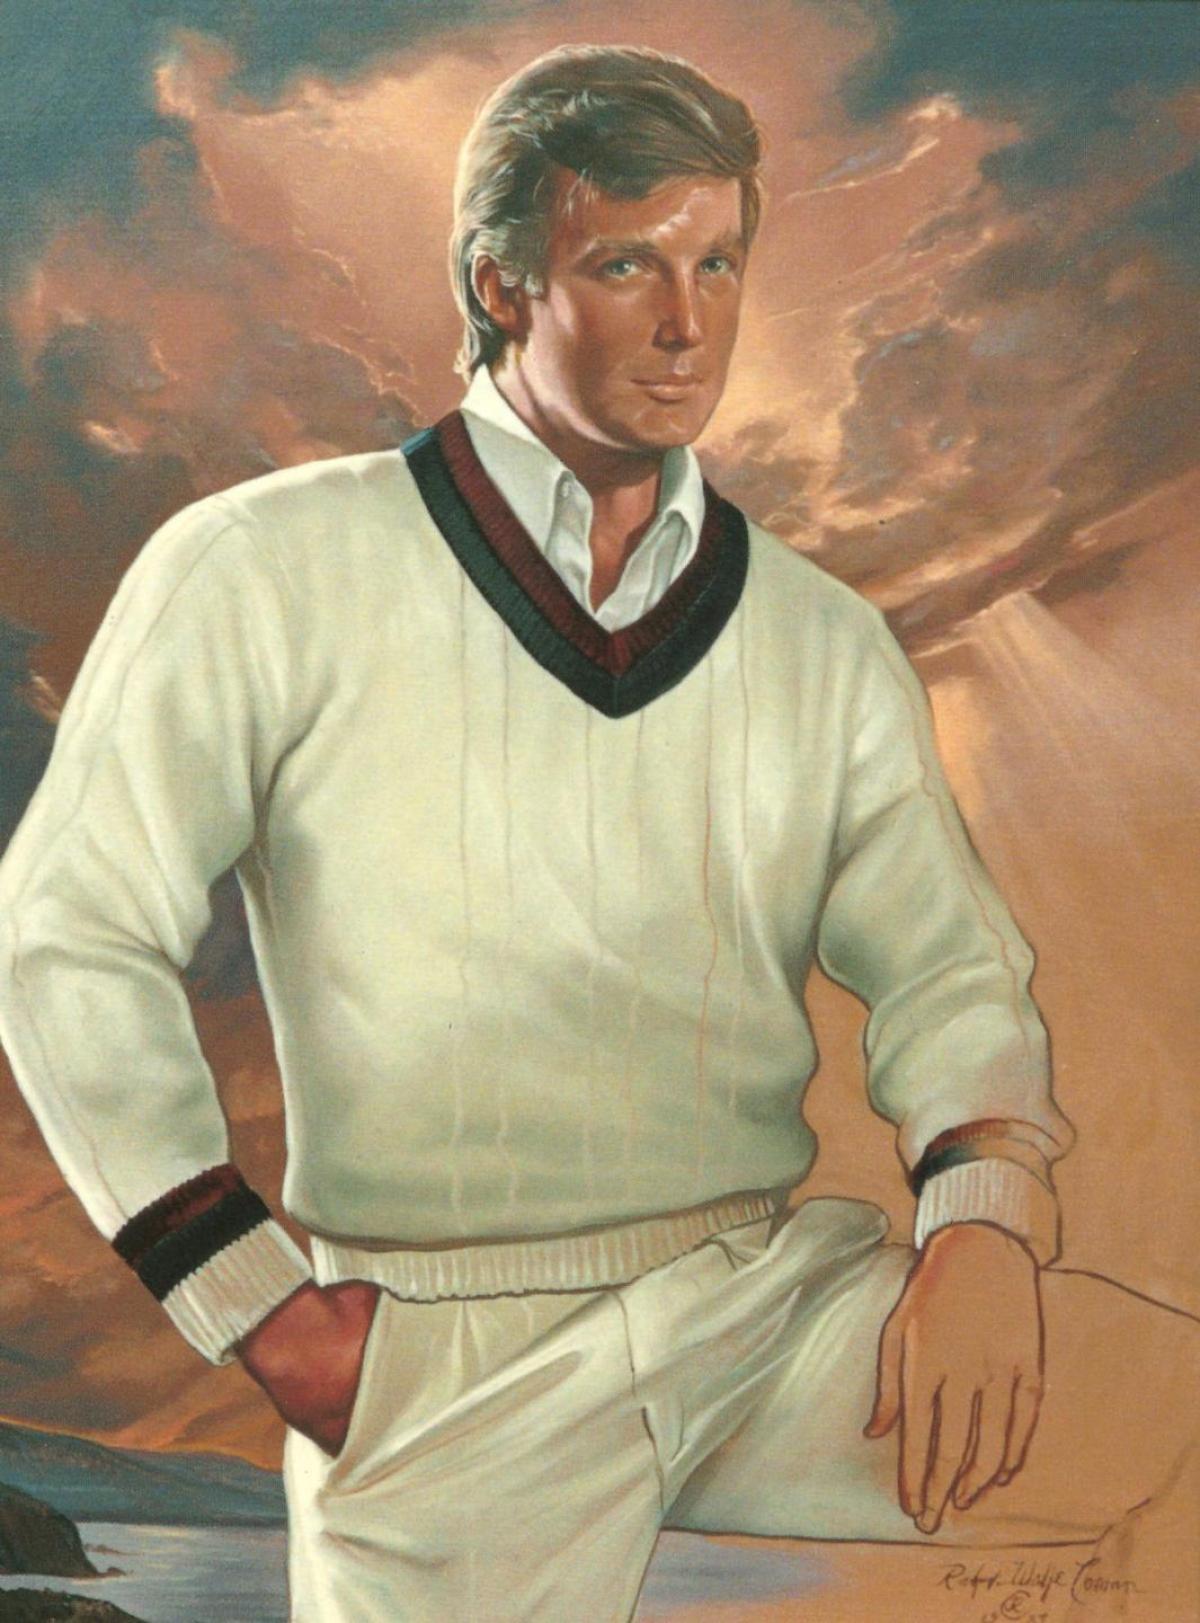 Ralph Wolfe Cowan's original portrait of Donald Trump,  The Entrepreneur (original version with unfinished hand), 1987